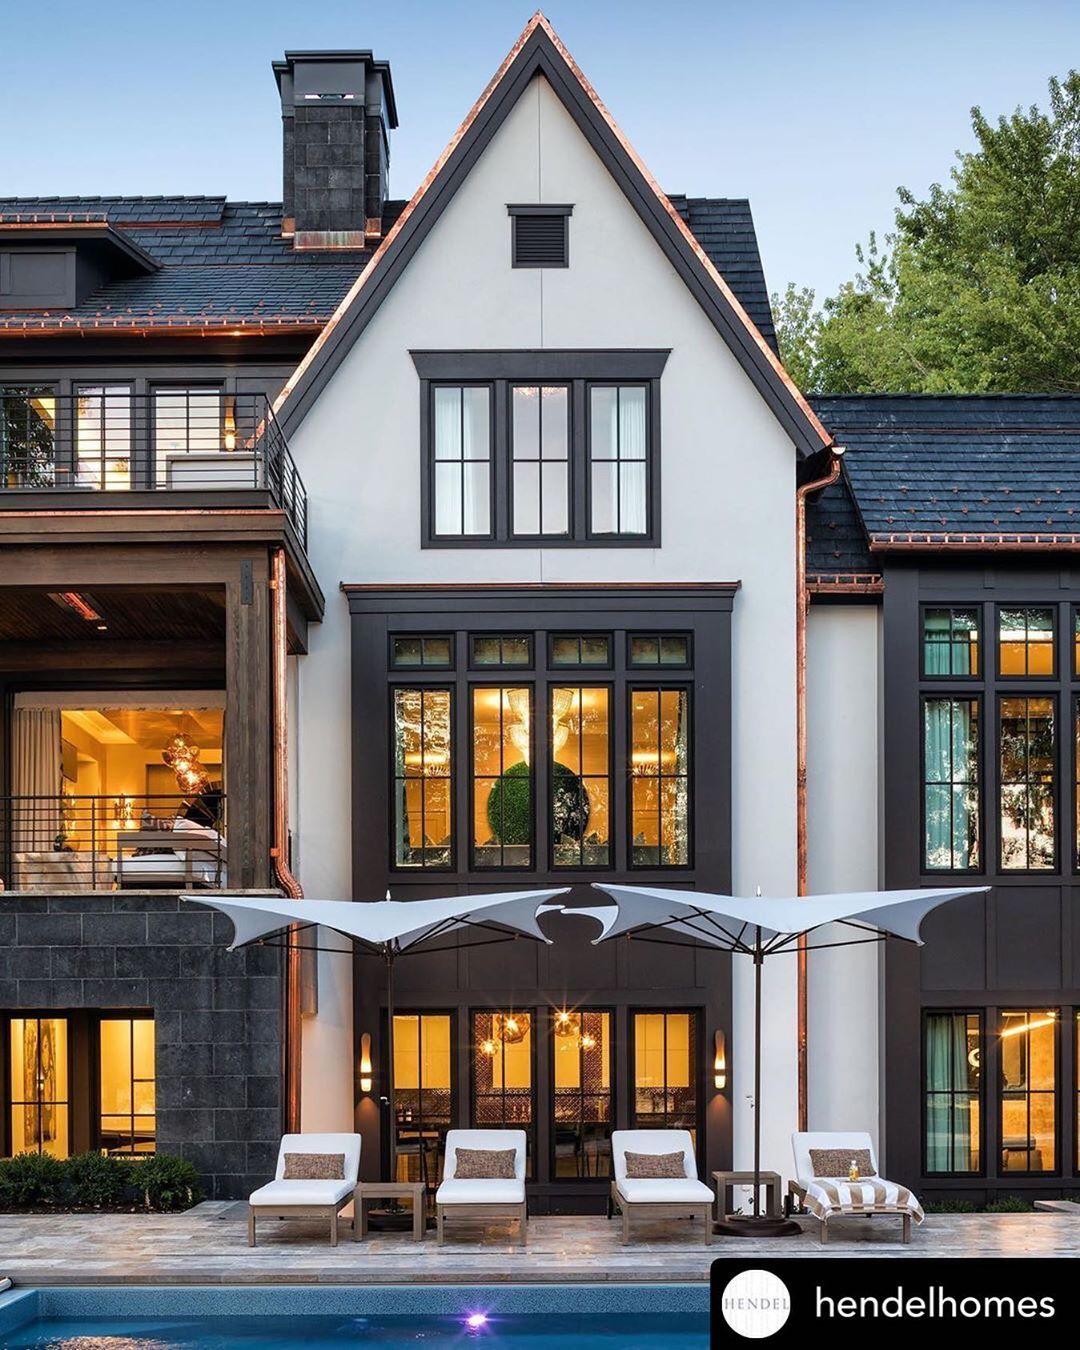 Loewen Windows And Doors On Instagram This Spectacular Home